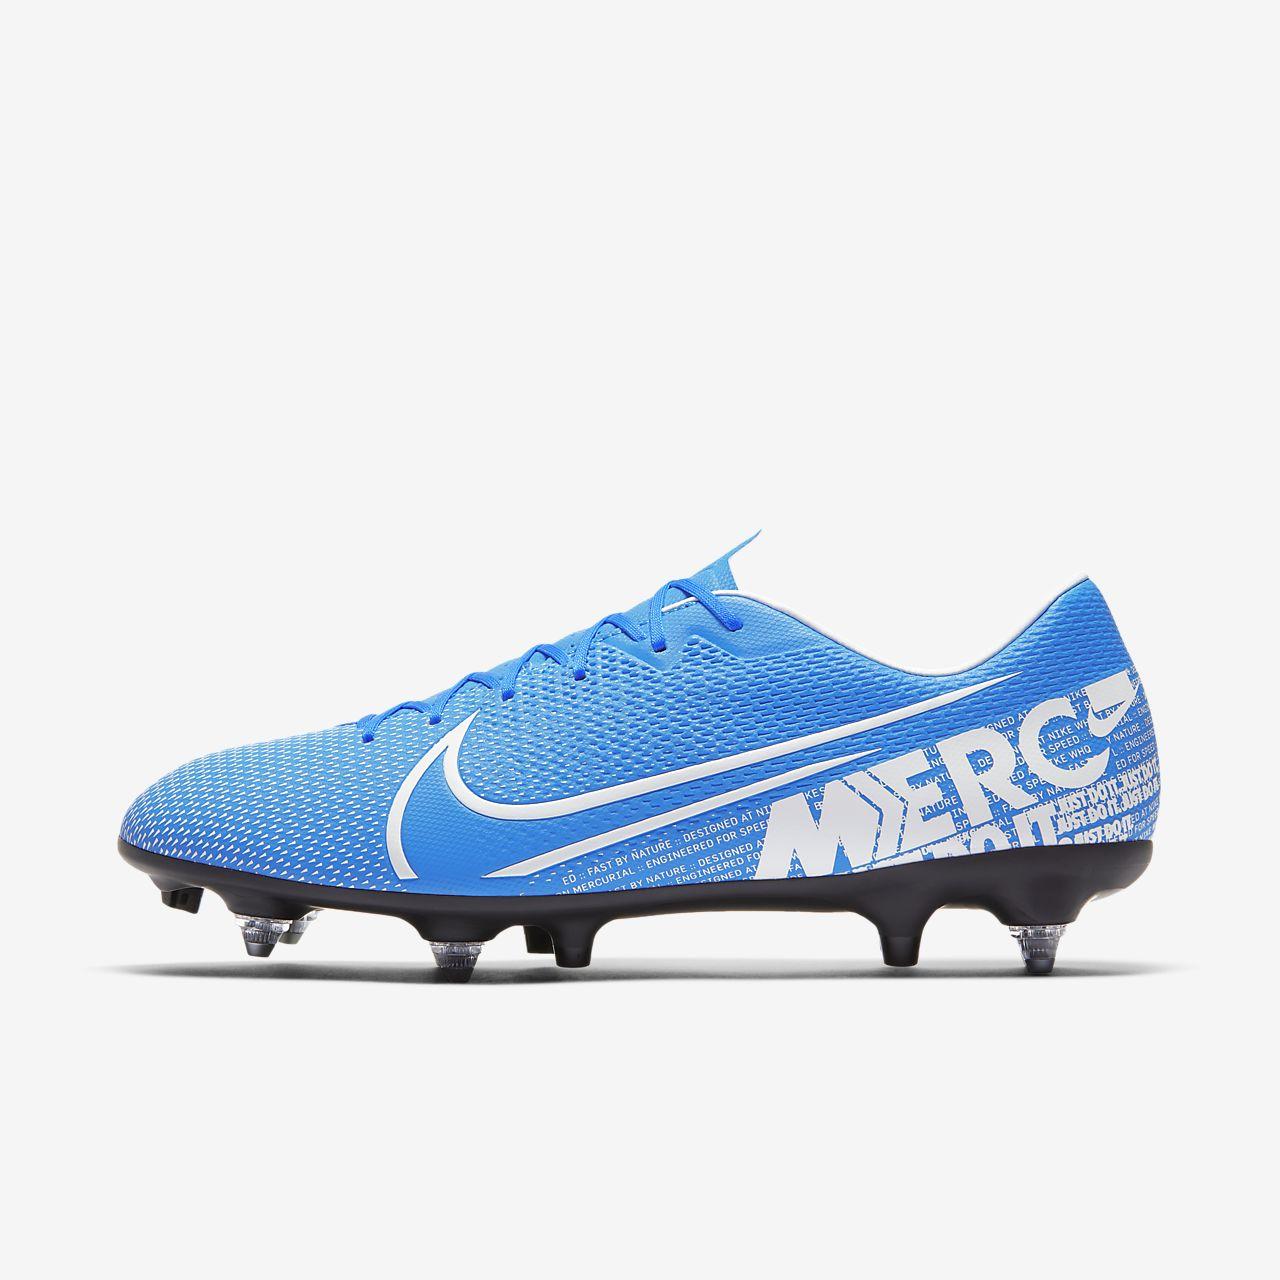 Nike Mercurial Vapor 13 Academy SG PRO Anti Clog Traction Voetbalschoen (zachte ondergrond)